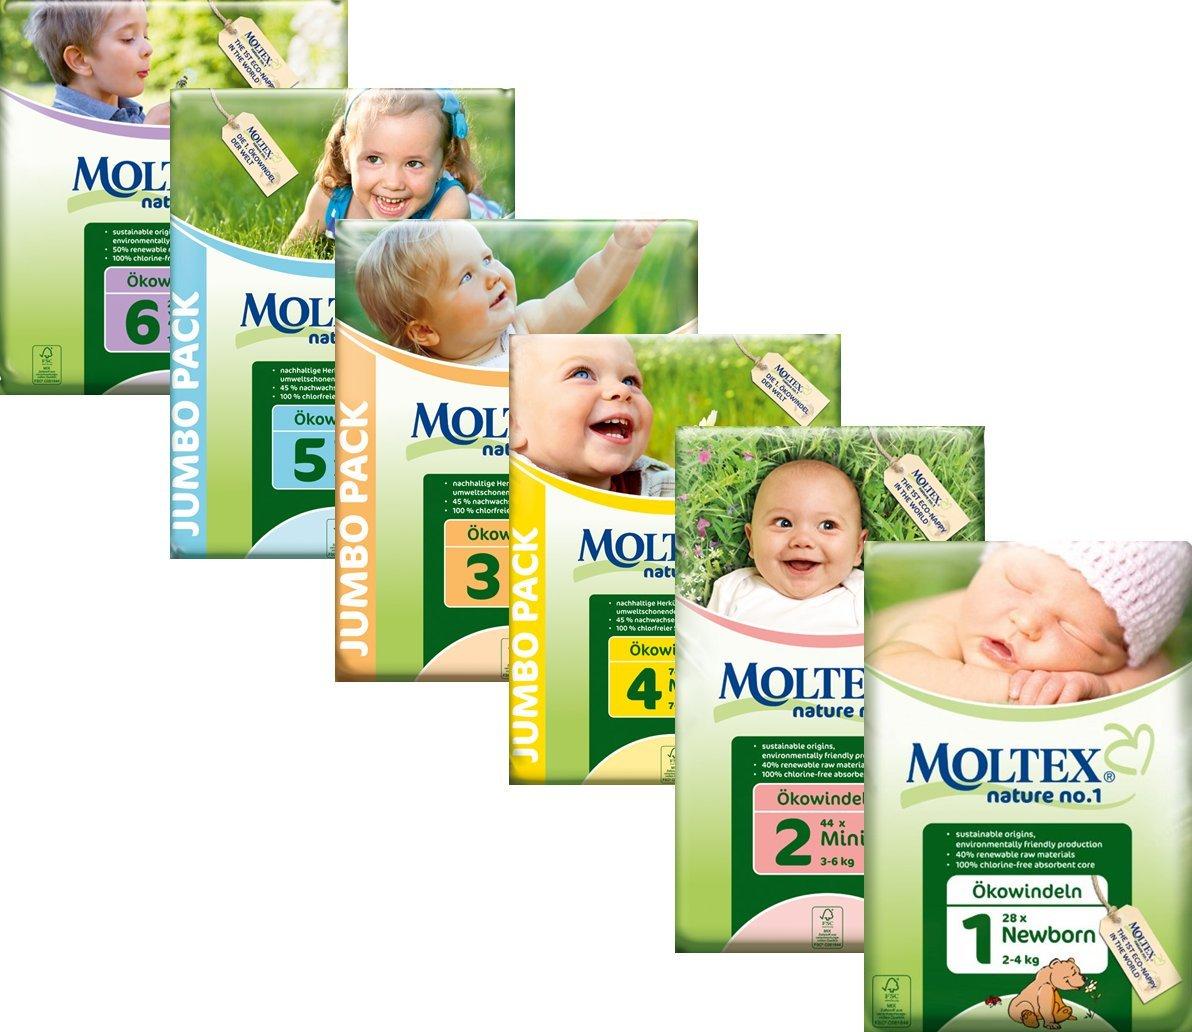 11-25 kg//24-55 lb Moltex Nature No1 Eco Nappy Junior Size 5 --Pack of 64 Nappies